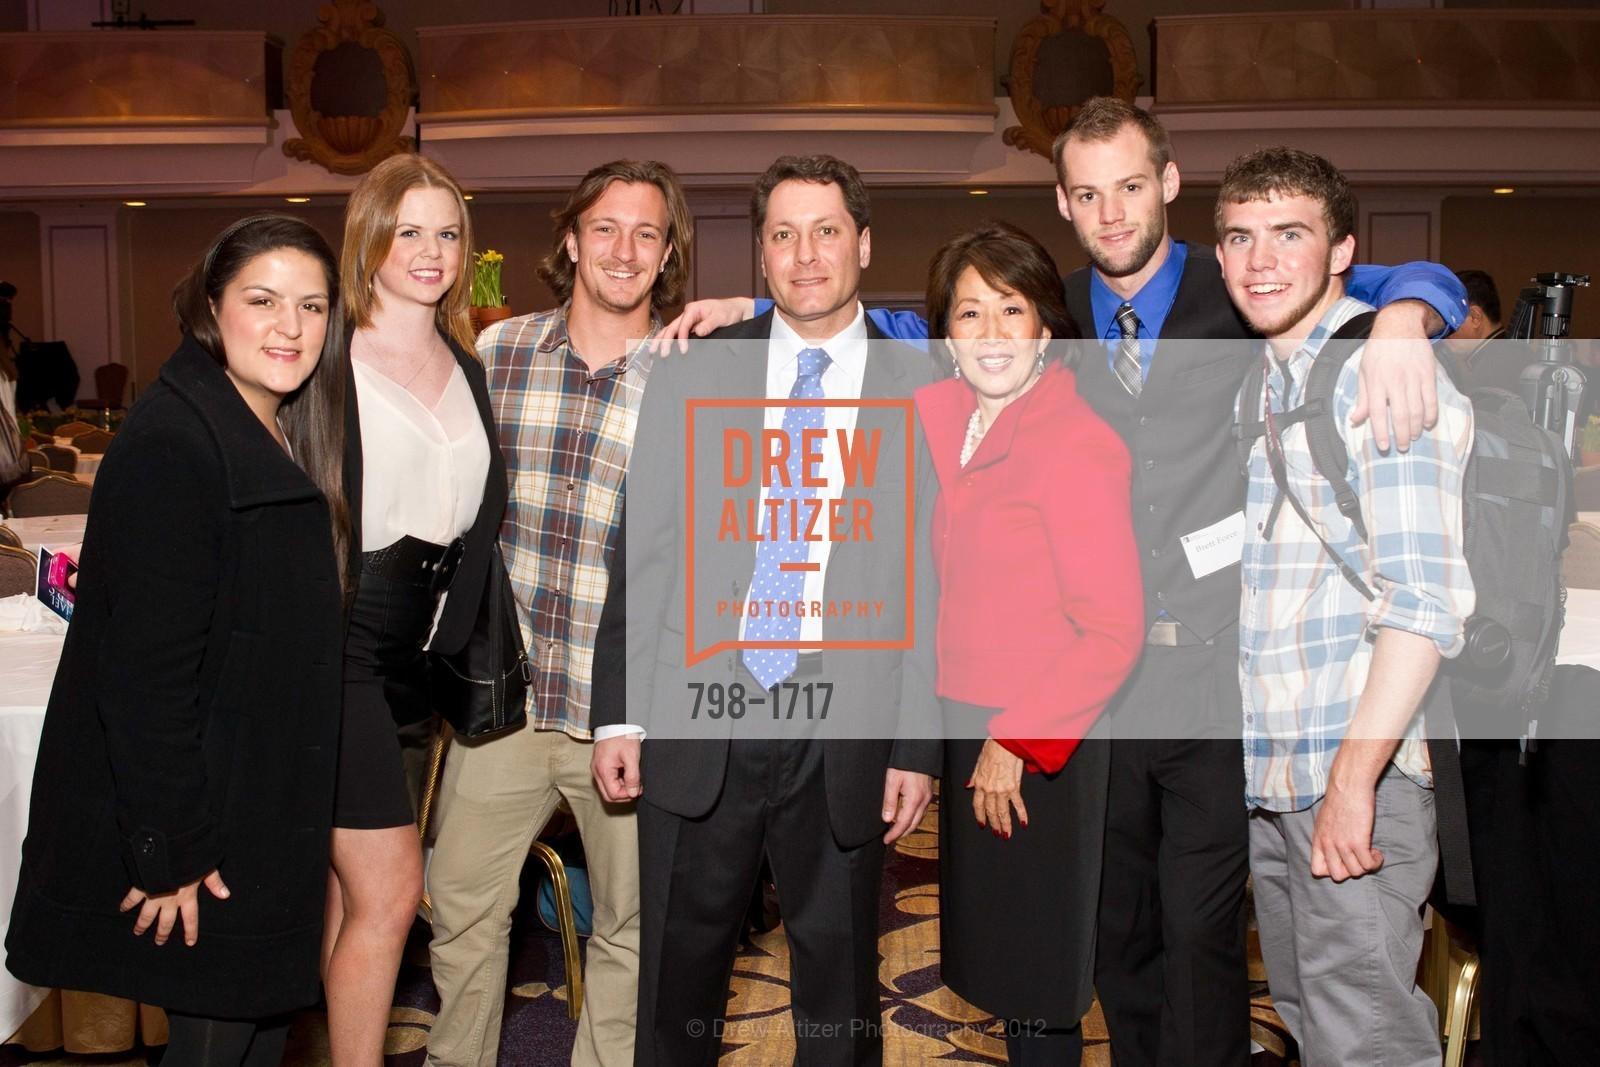 Alejandra Galan, Morgan McKnight, Todd Stave, Jan Yanehiro, Brett Force, Photo #798-1717